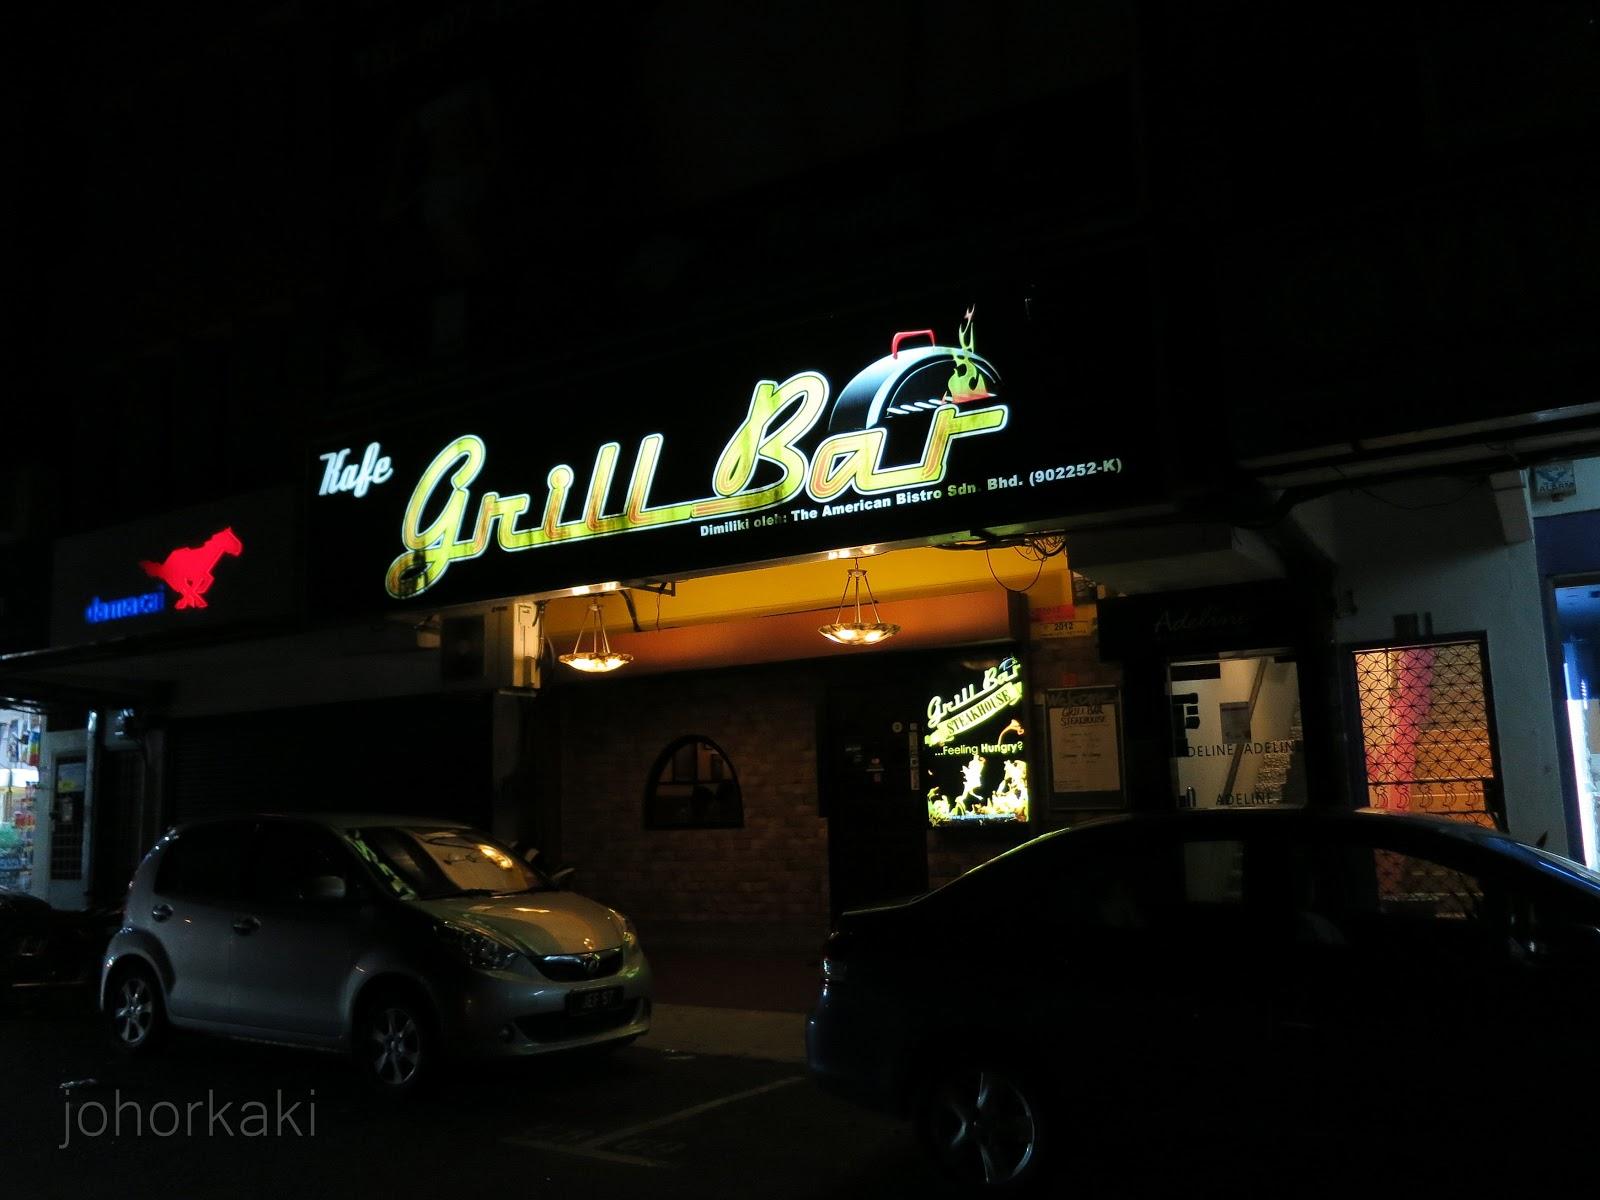 Grill Bar Steakhouse Johor Bahru